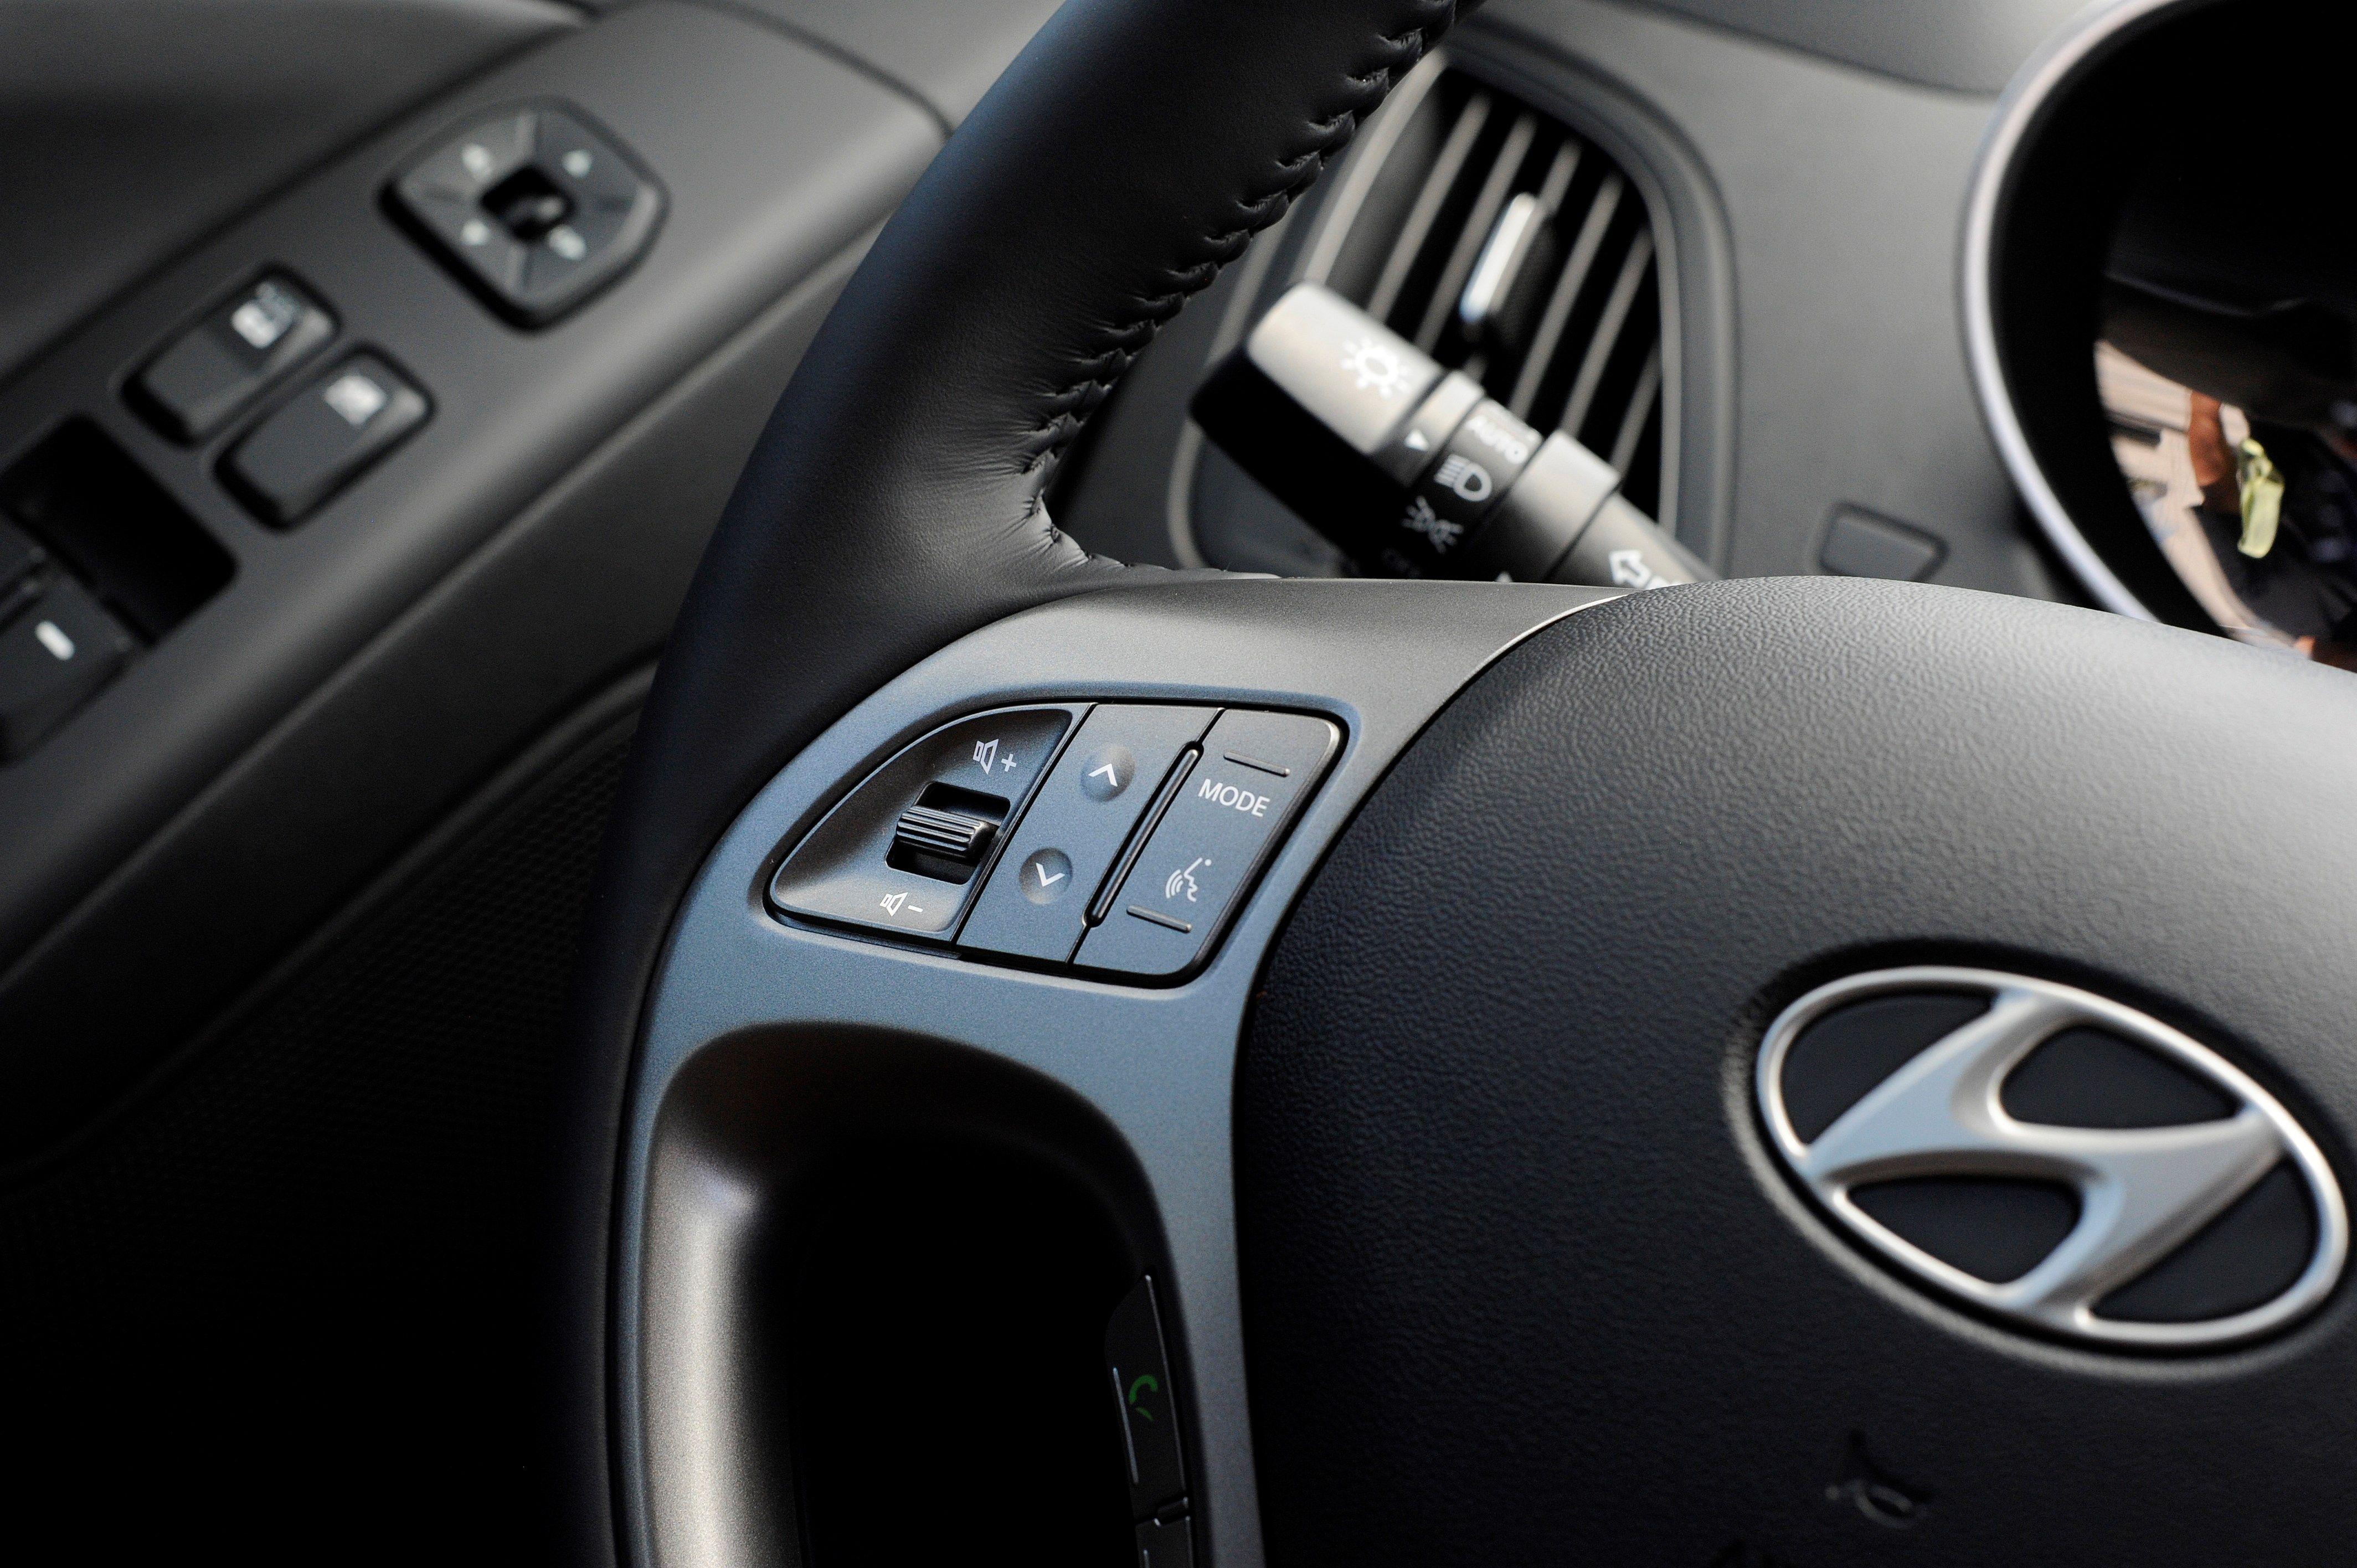 2014 hyundai tucson steering wheel controls for audio phone standard